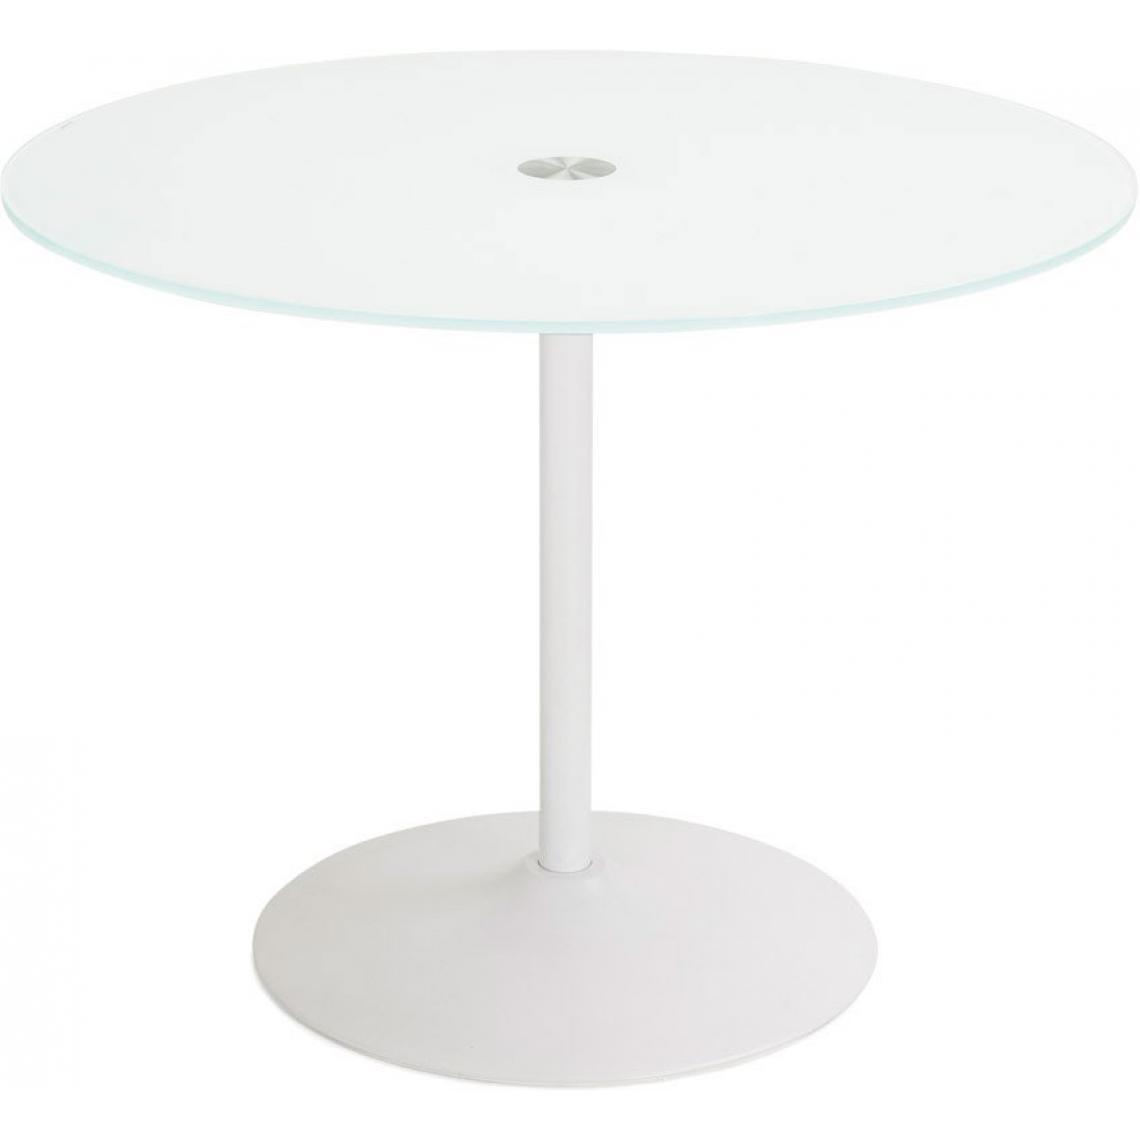 table a manger blanche ronde design plateau en verre bloom